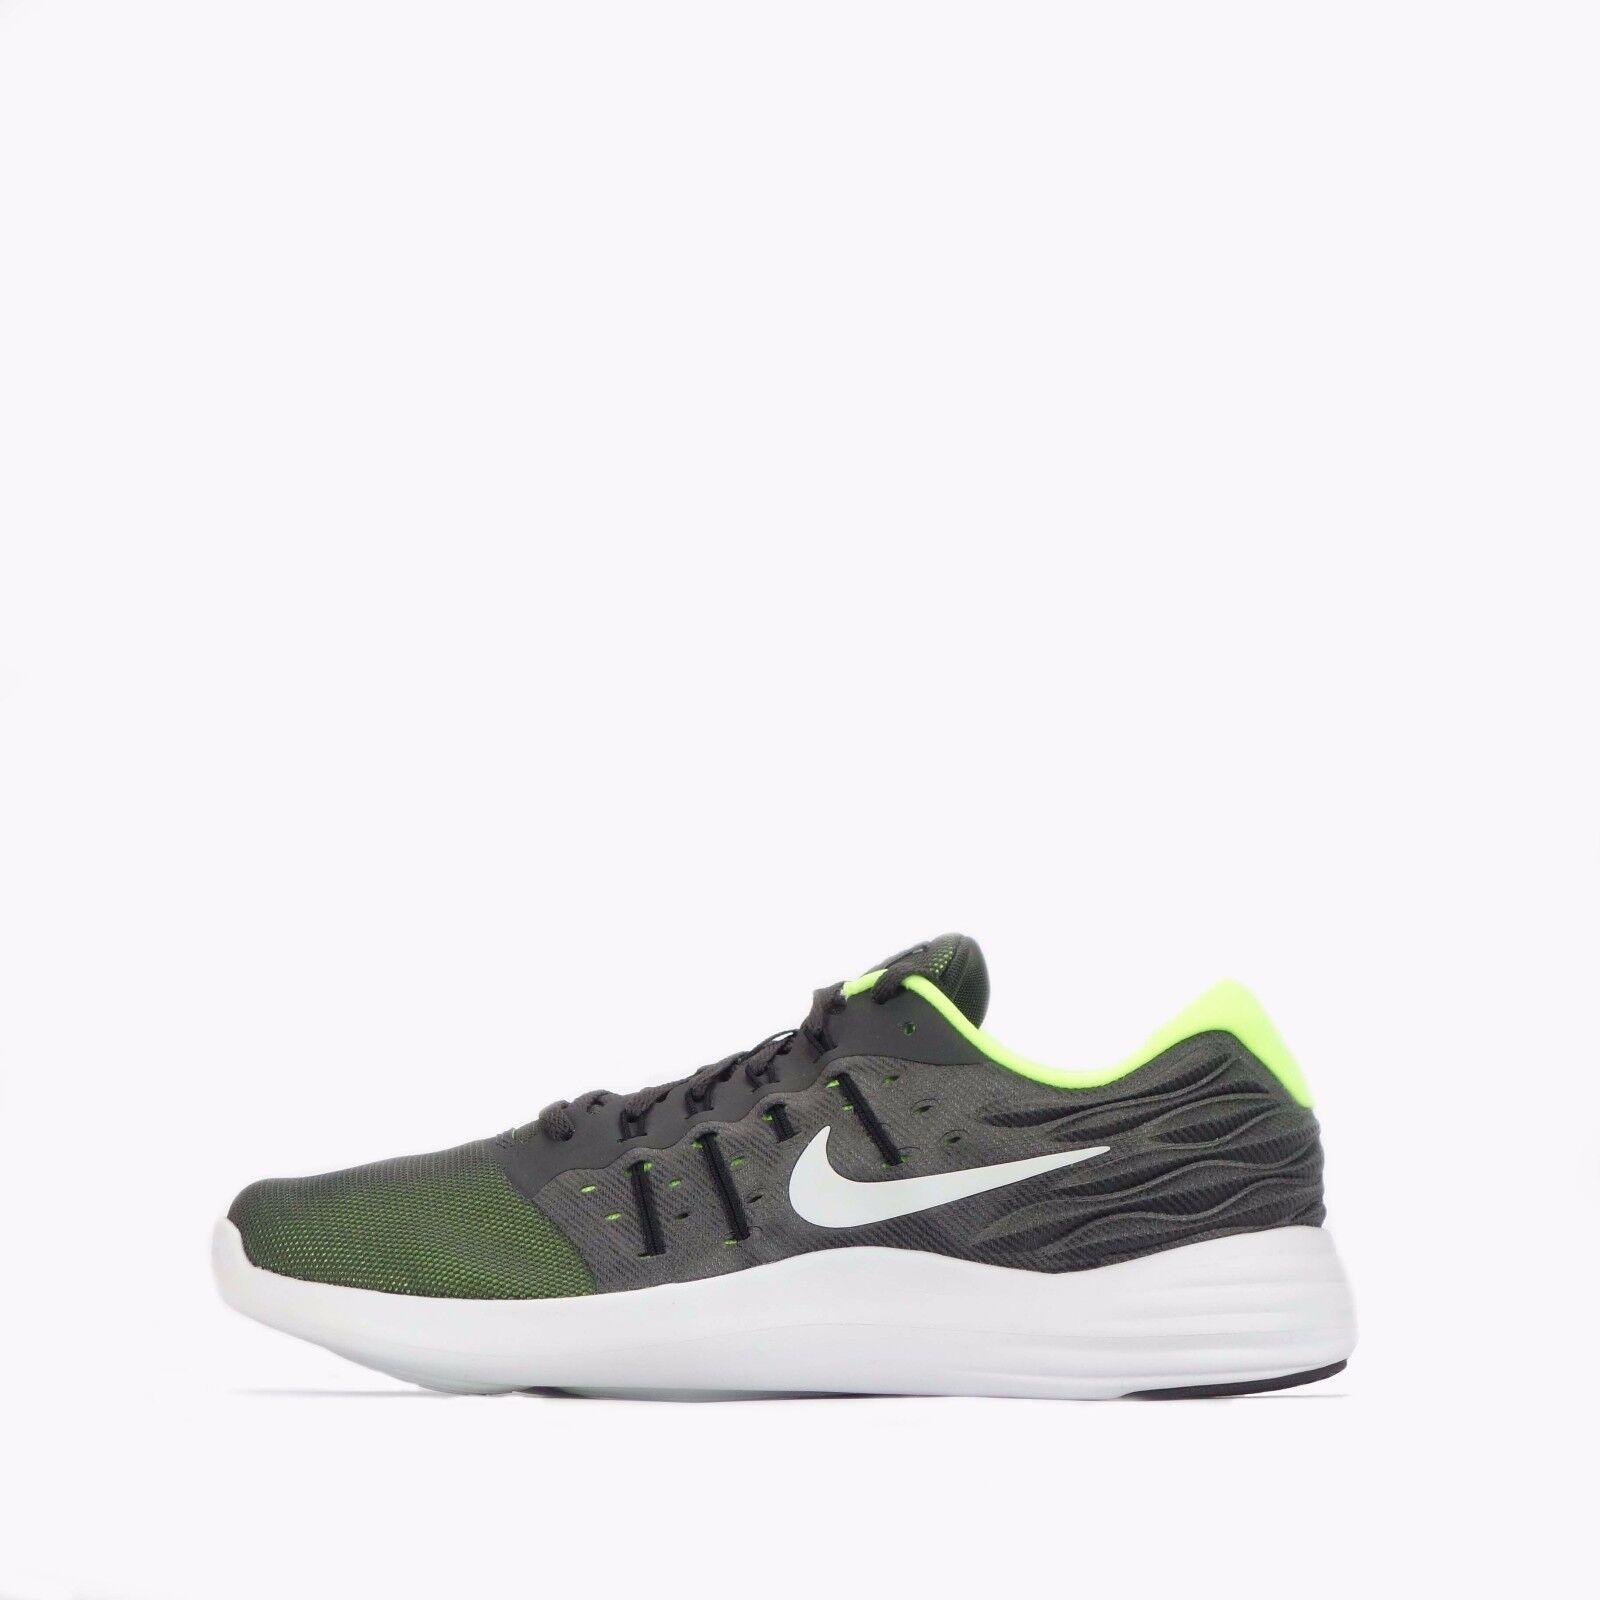 brand new f4c29 033c9 Nike LunarStelos Hommes Running Chaussures Midnight Fogblanc Noir - Noir  Fogblanc 82eeb0